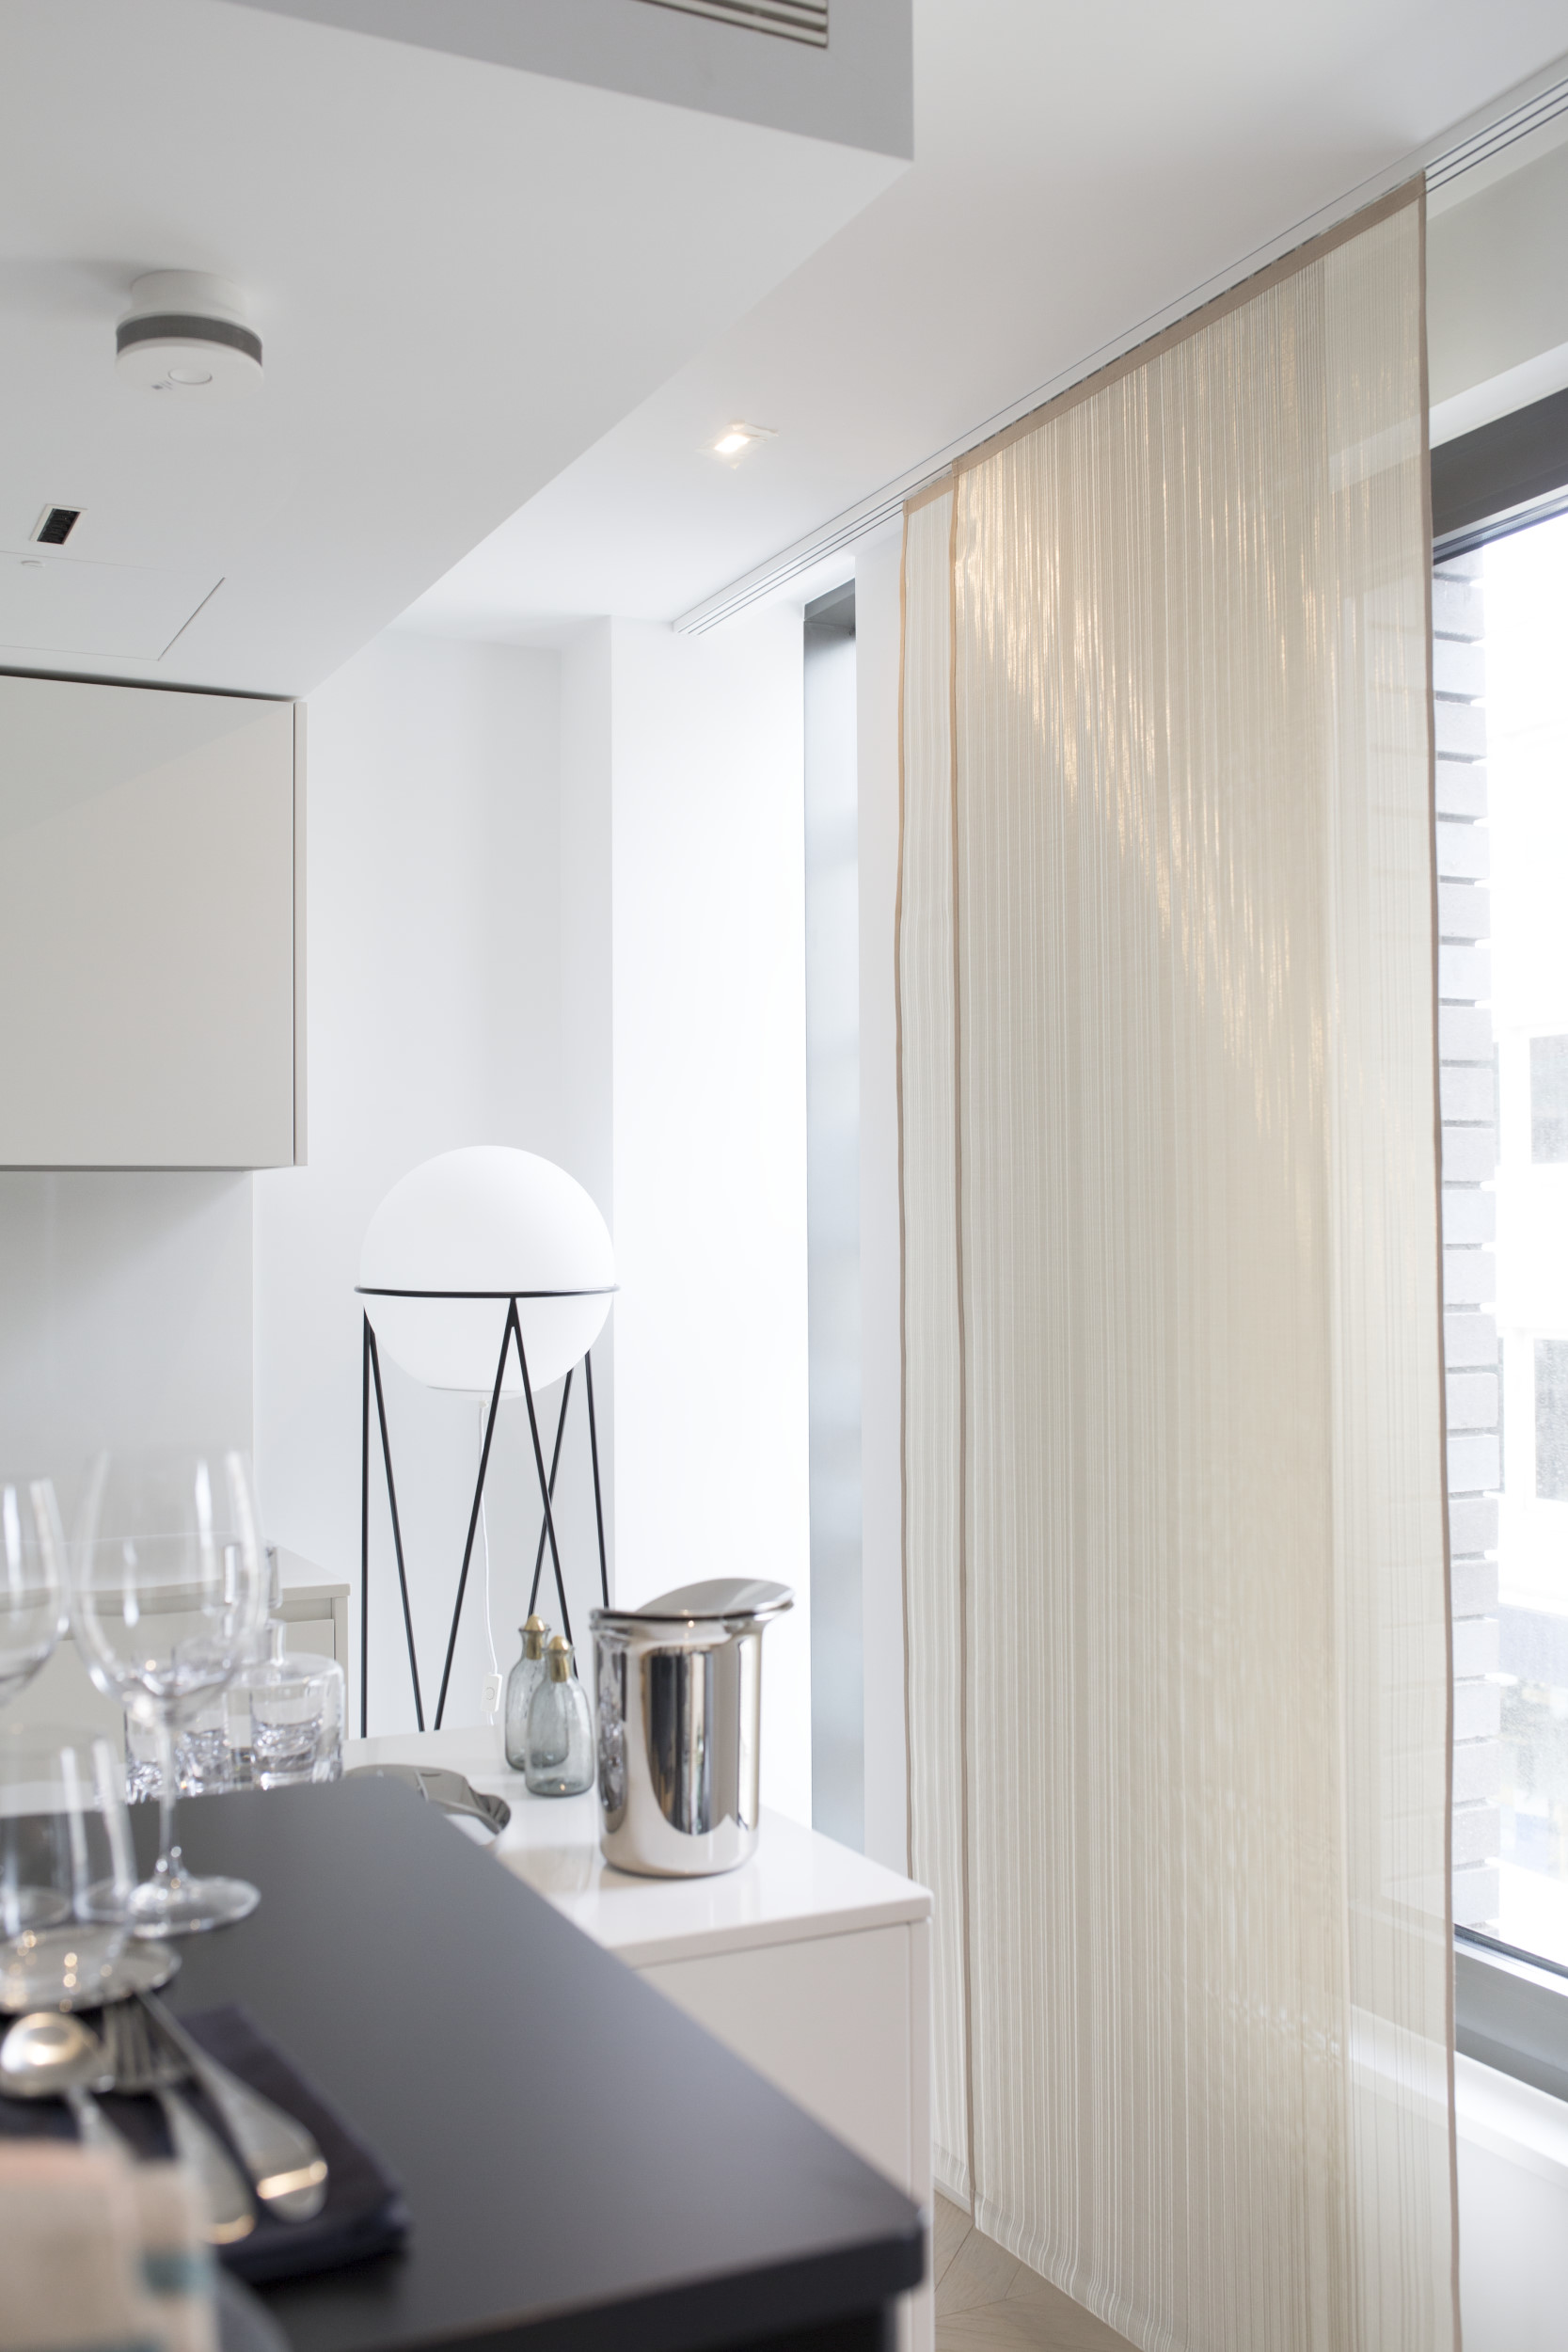 Sophie-Mallebranche-Sliding-Panels-Window-Treatments-London-Residential